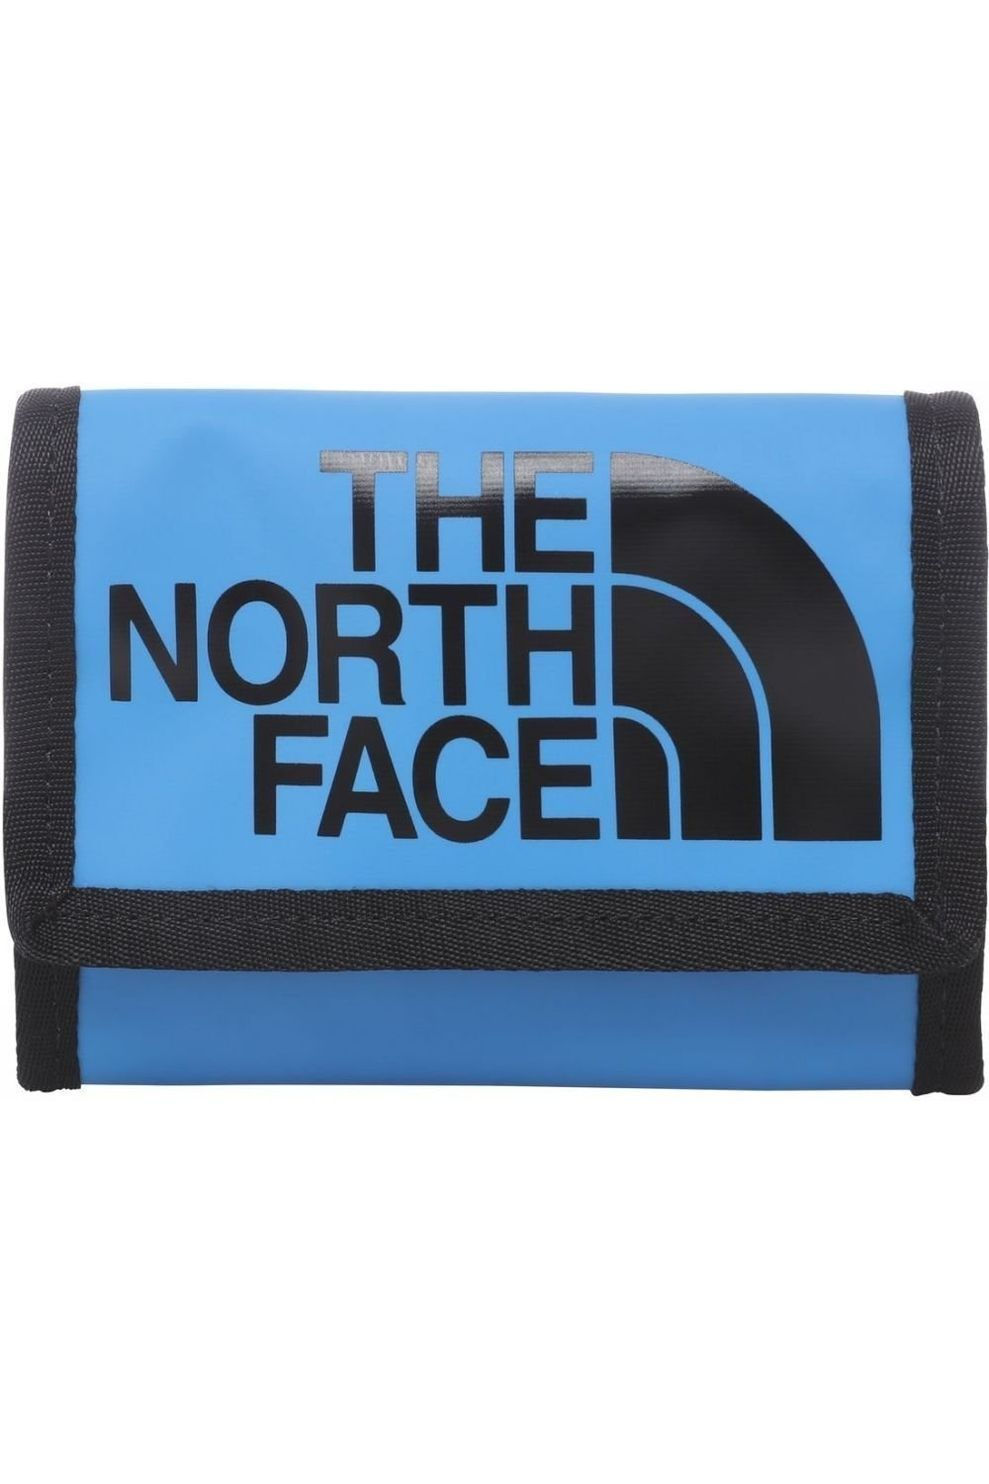 The North Face Portefeuille Base Camp Wallet - Blauw /Zwart